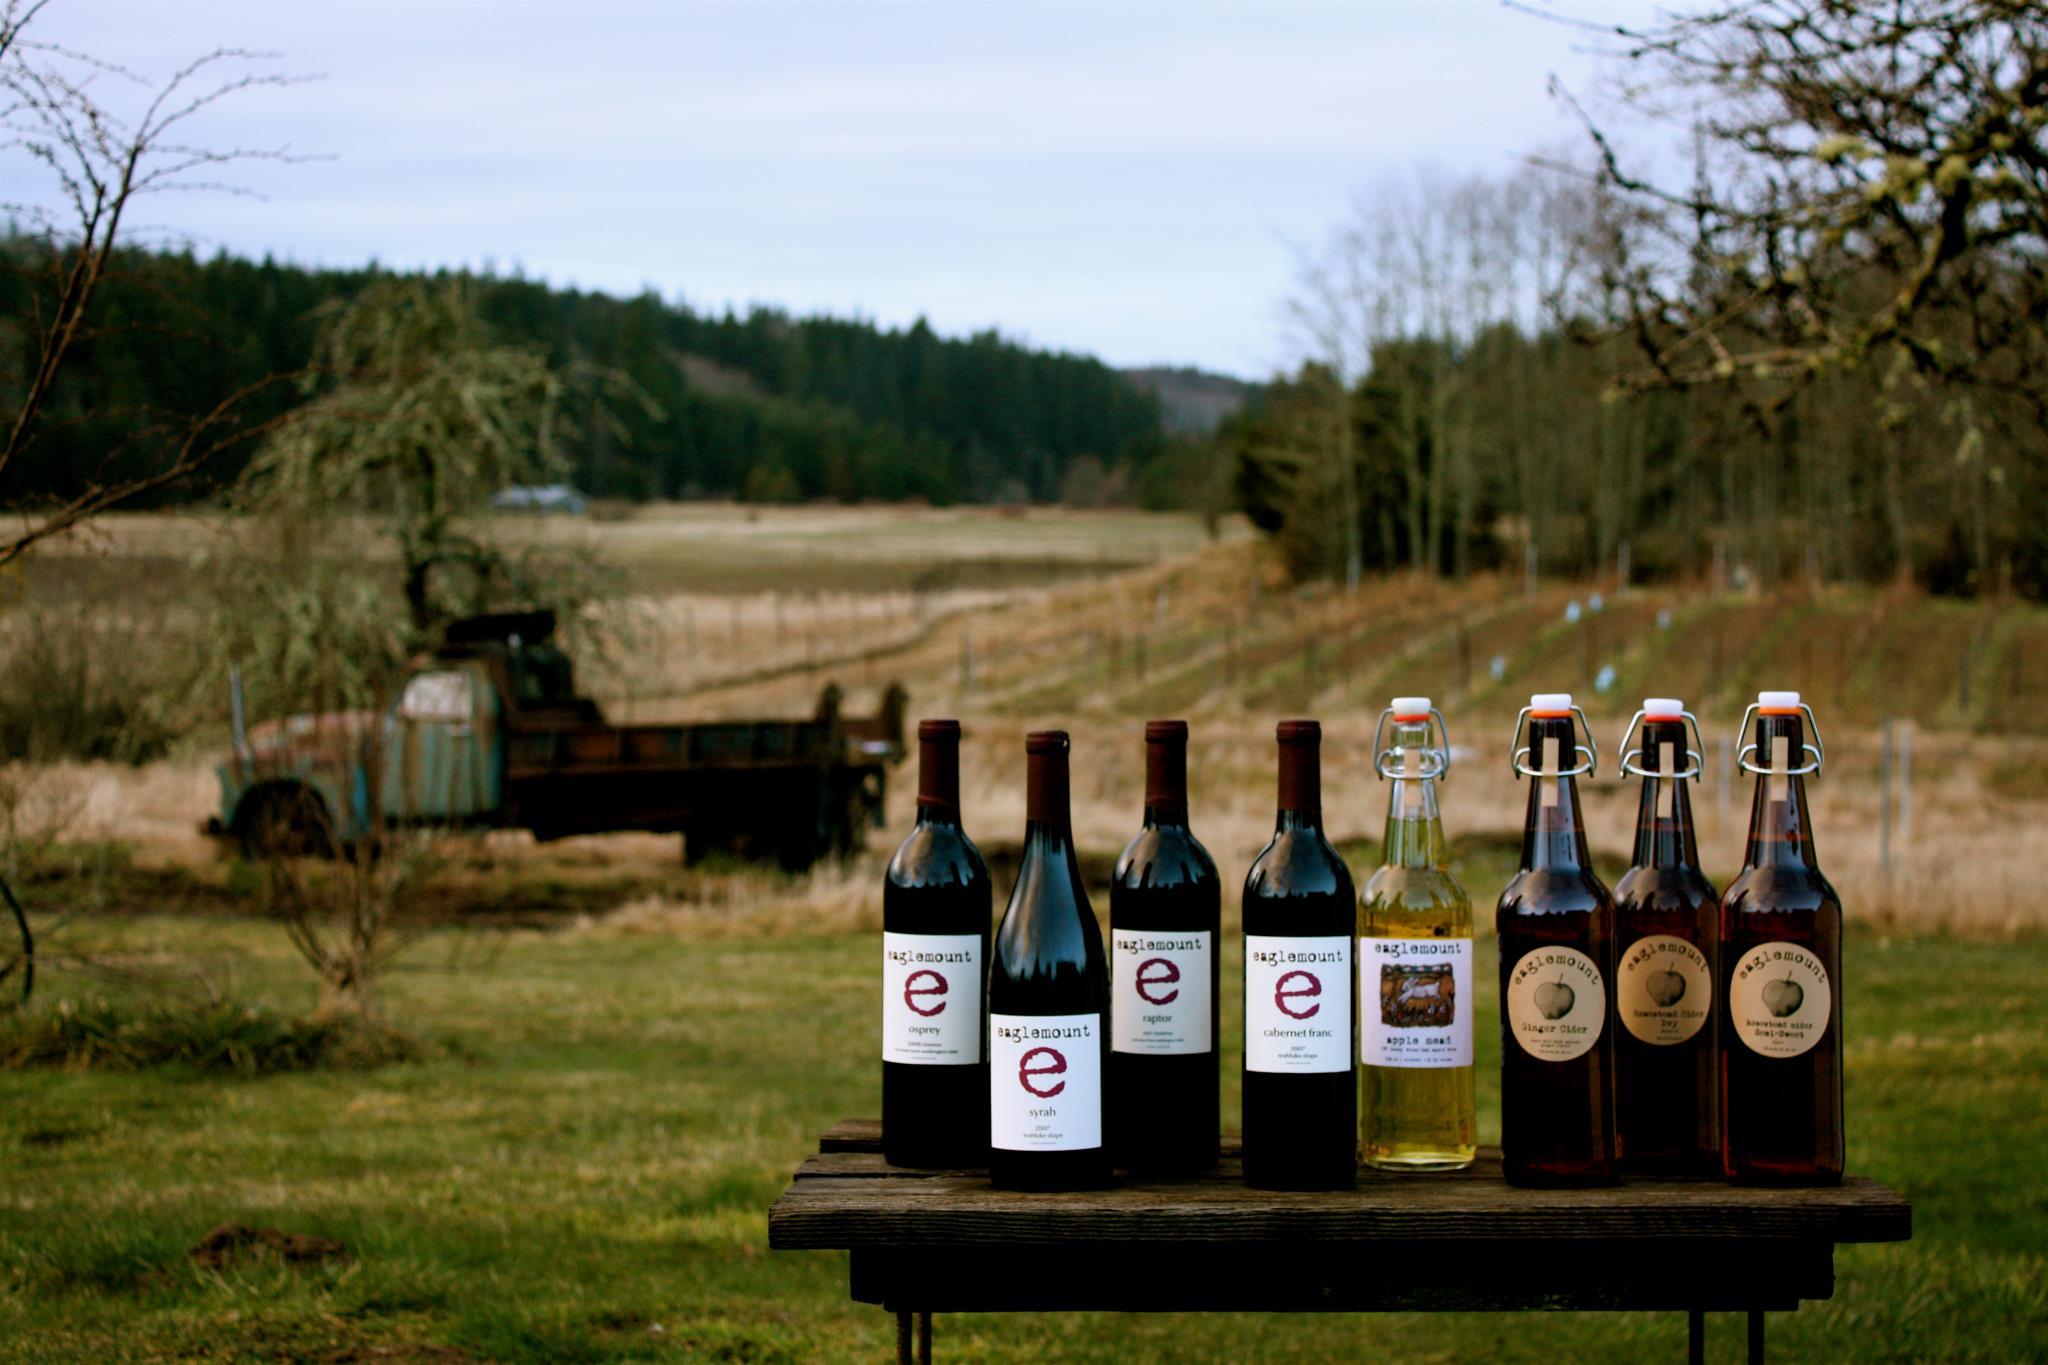 Photo Credit: Eaglemount Winery & Cidery/Piper Corbett